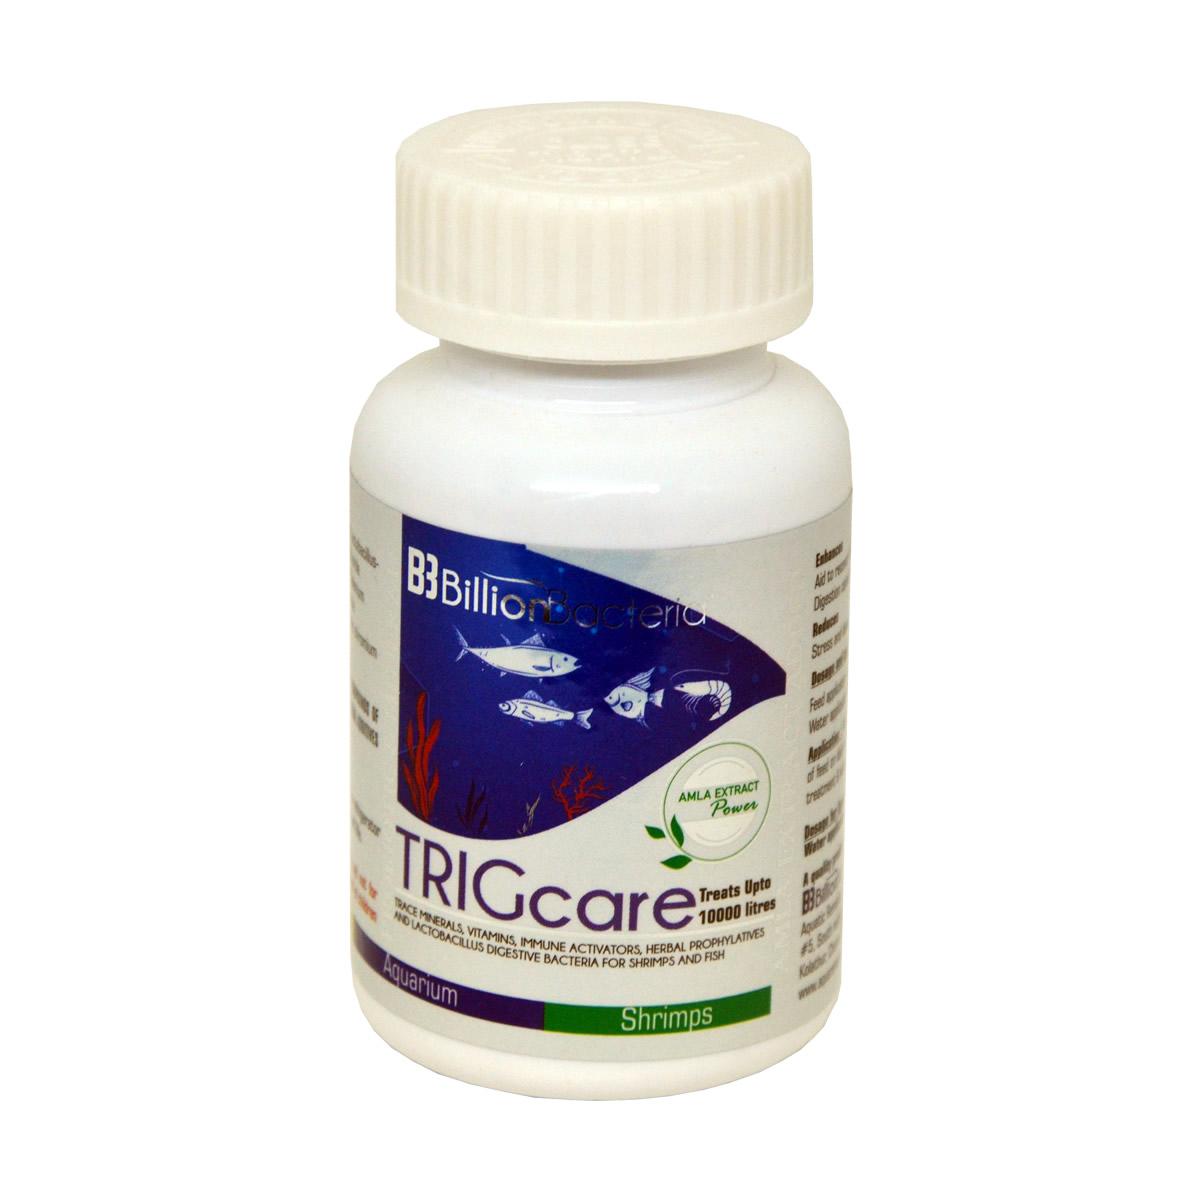 Billion Bacteria By Aquatic Remedies Trig Care 50g